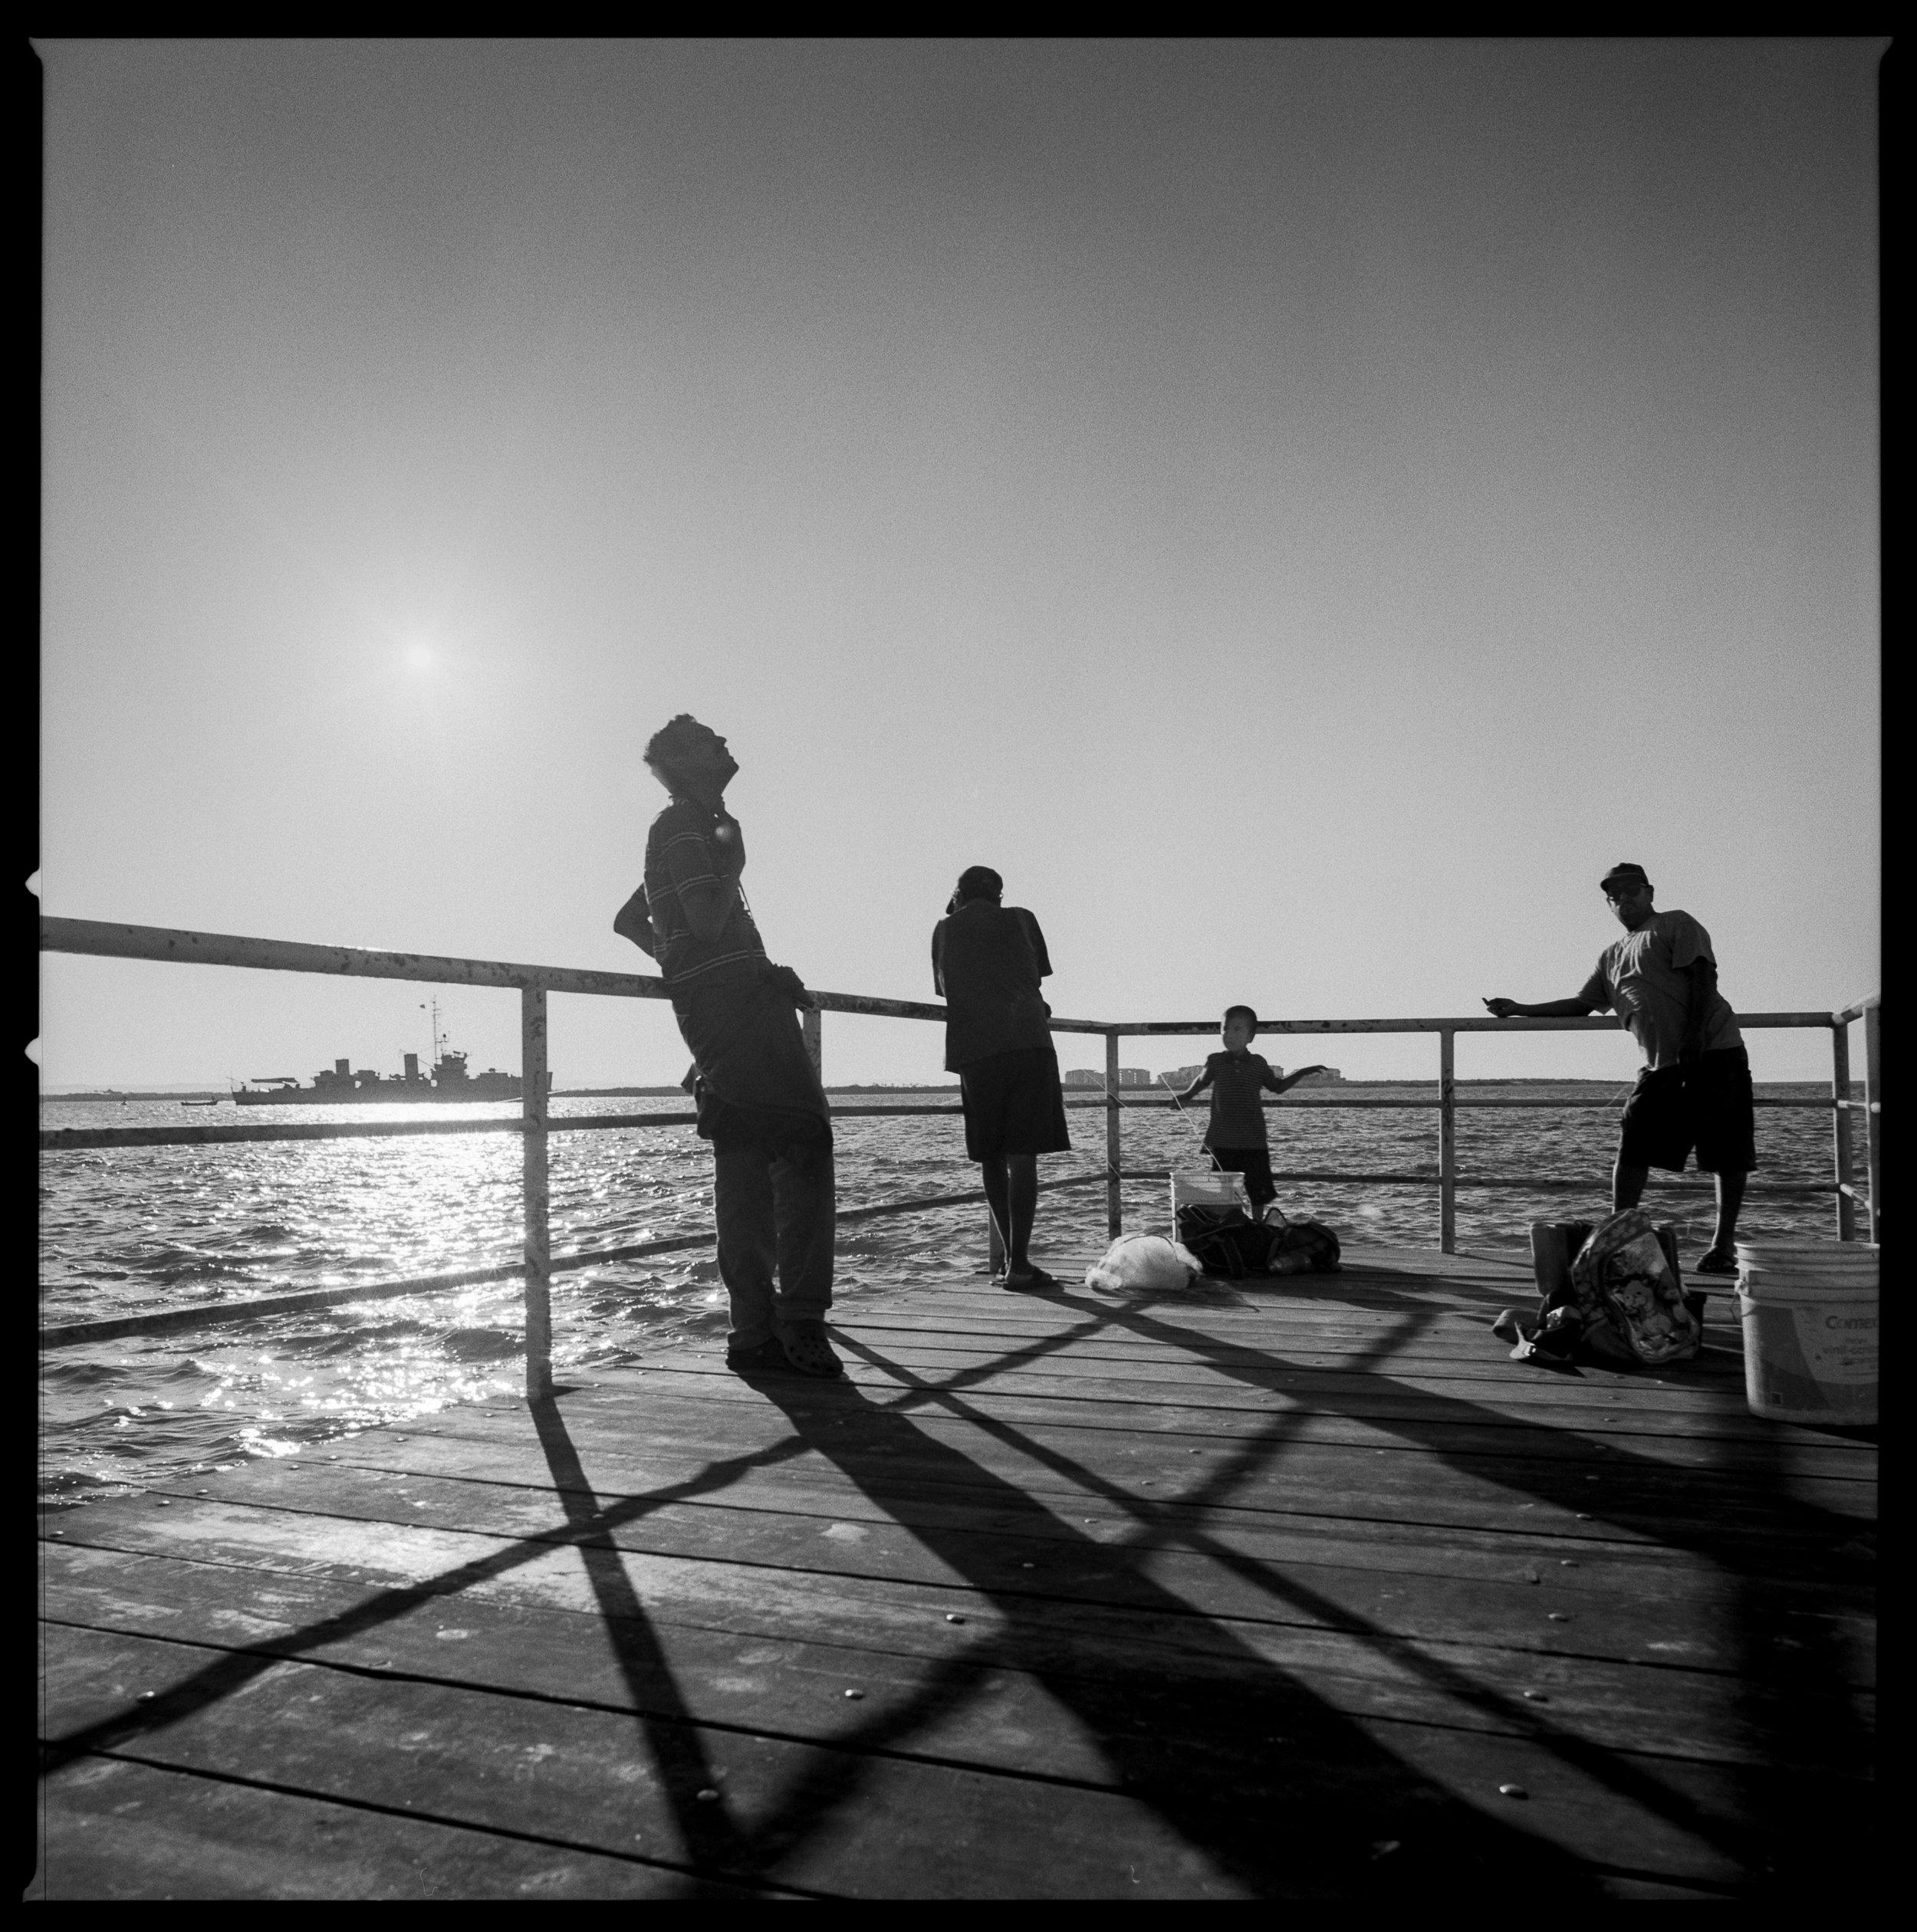 On the pier La Paz, Mexico, 2018